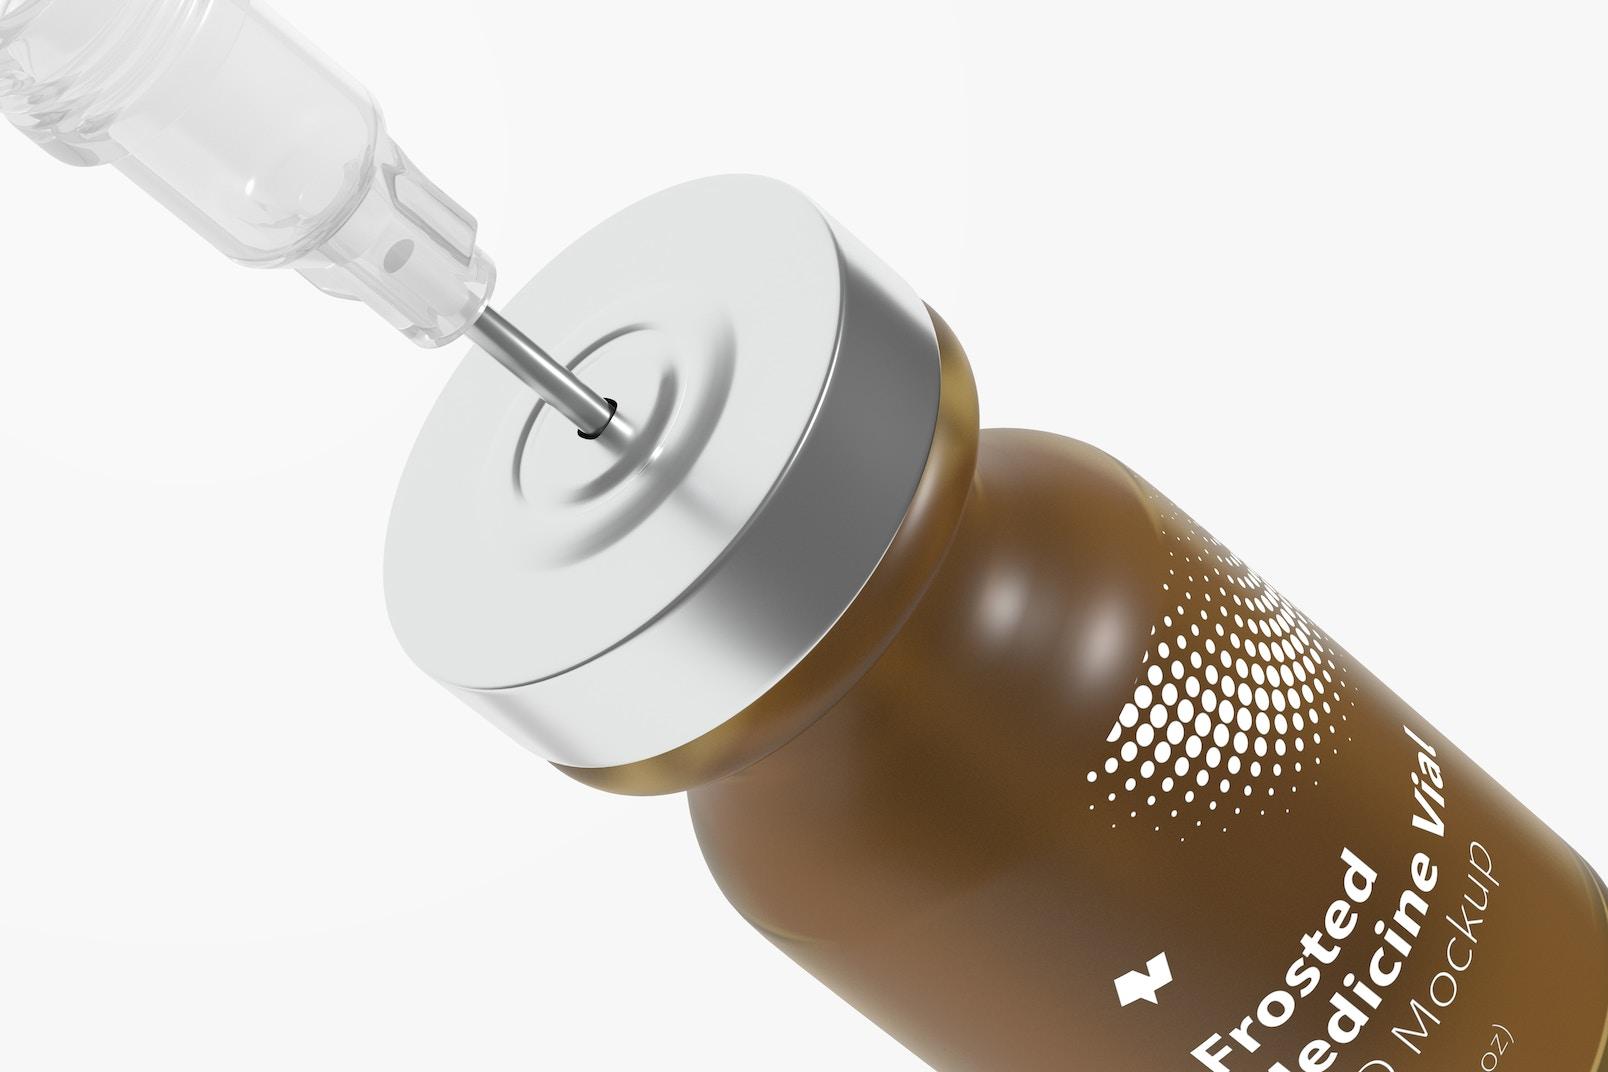 2 ml Frosted Glass Medicine Vial Bottle Mockup, Close Up